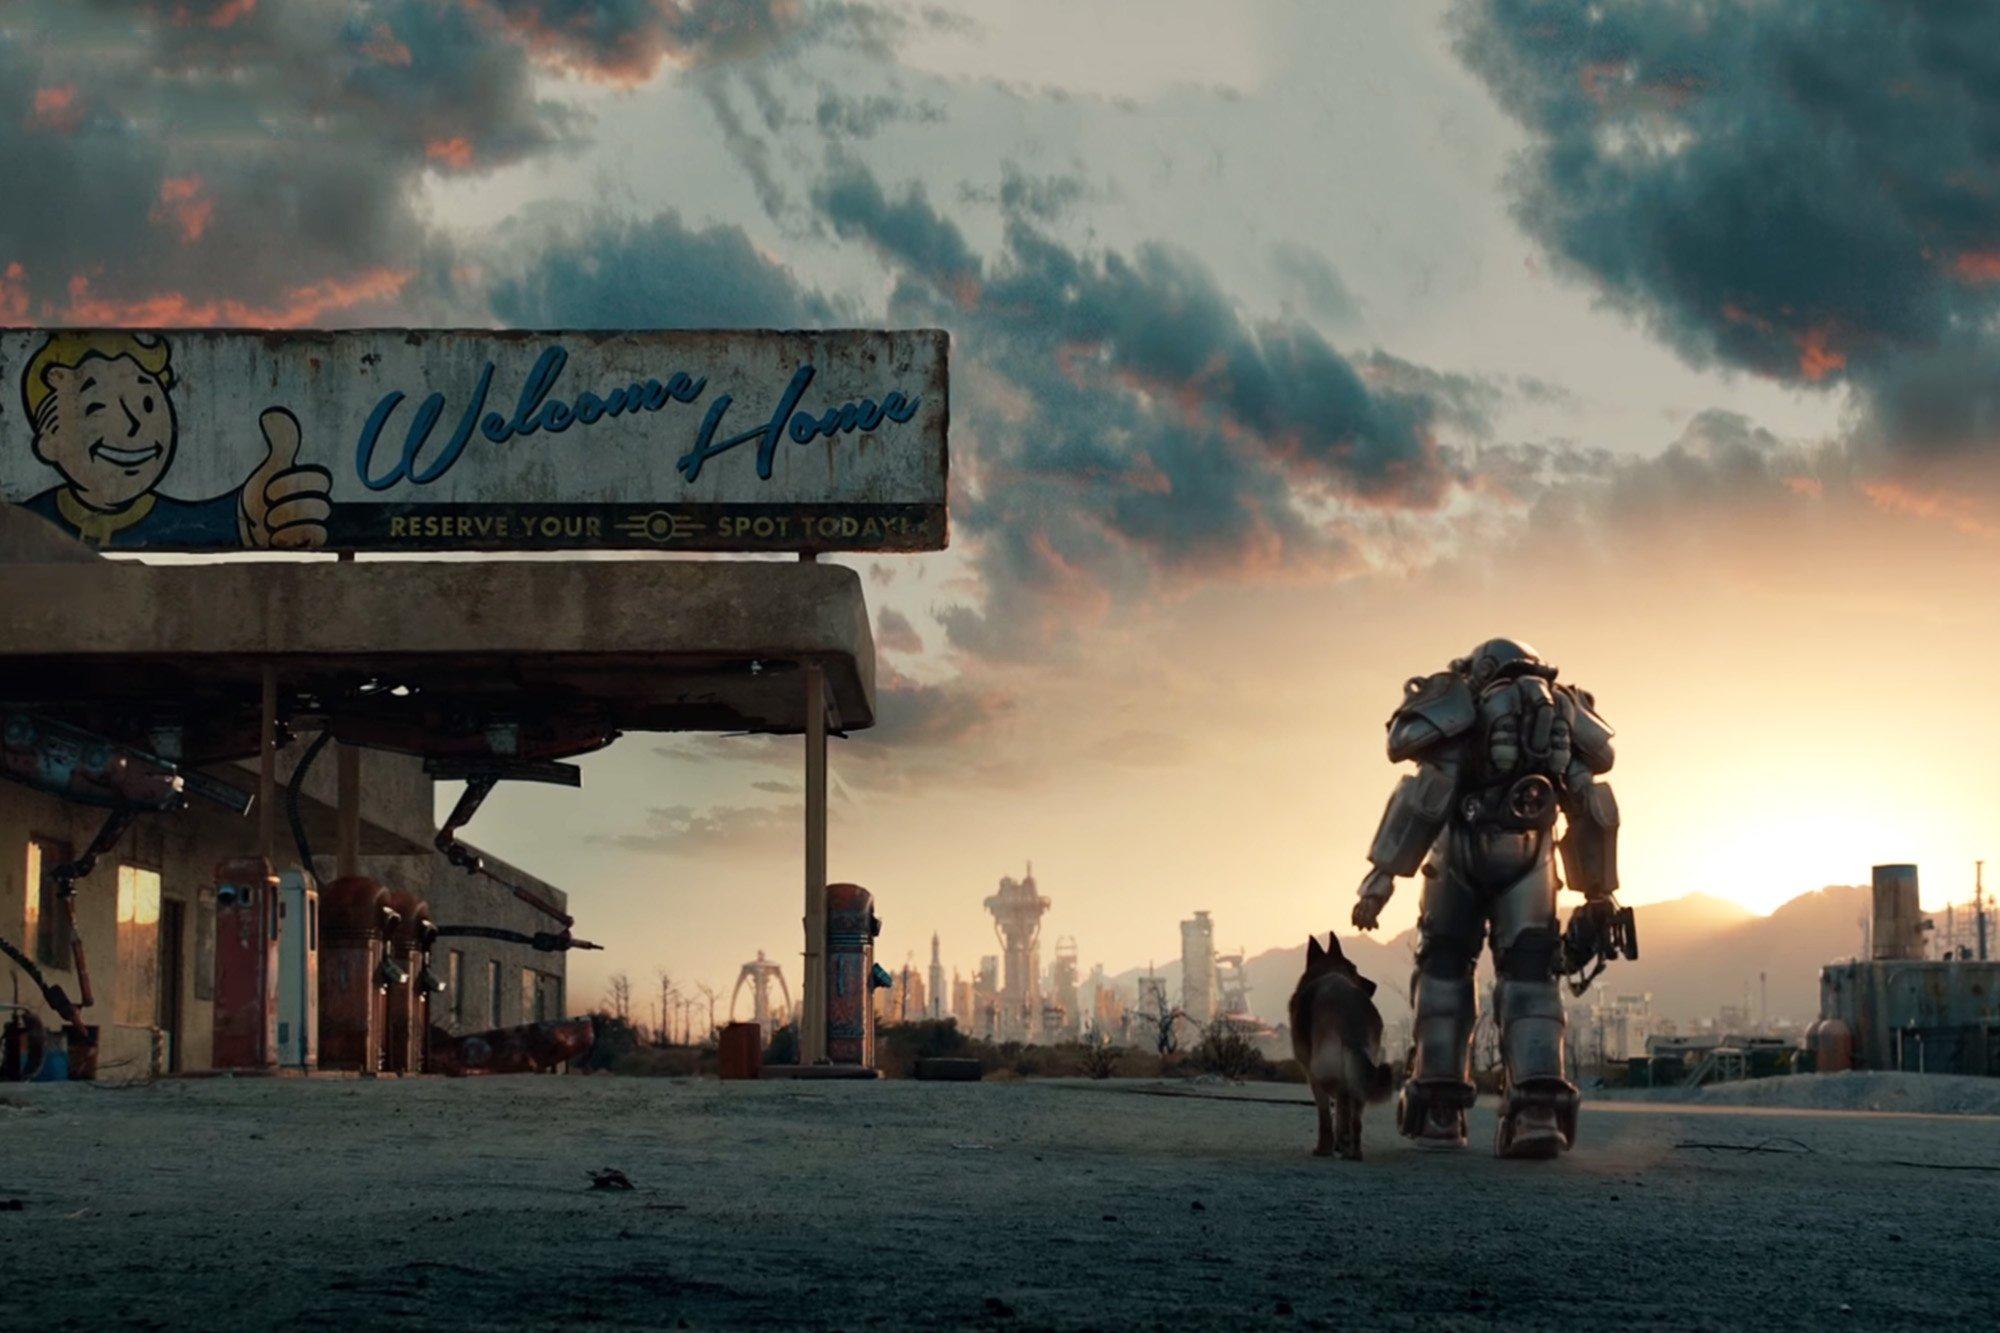 Fallout 4 Live Wallpaper - WallpaperSafari